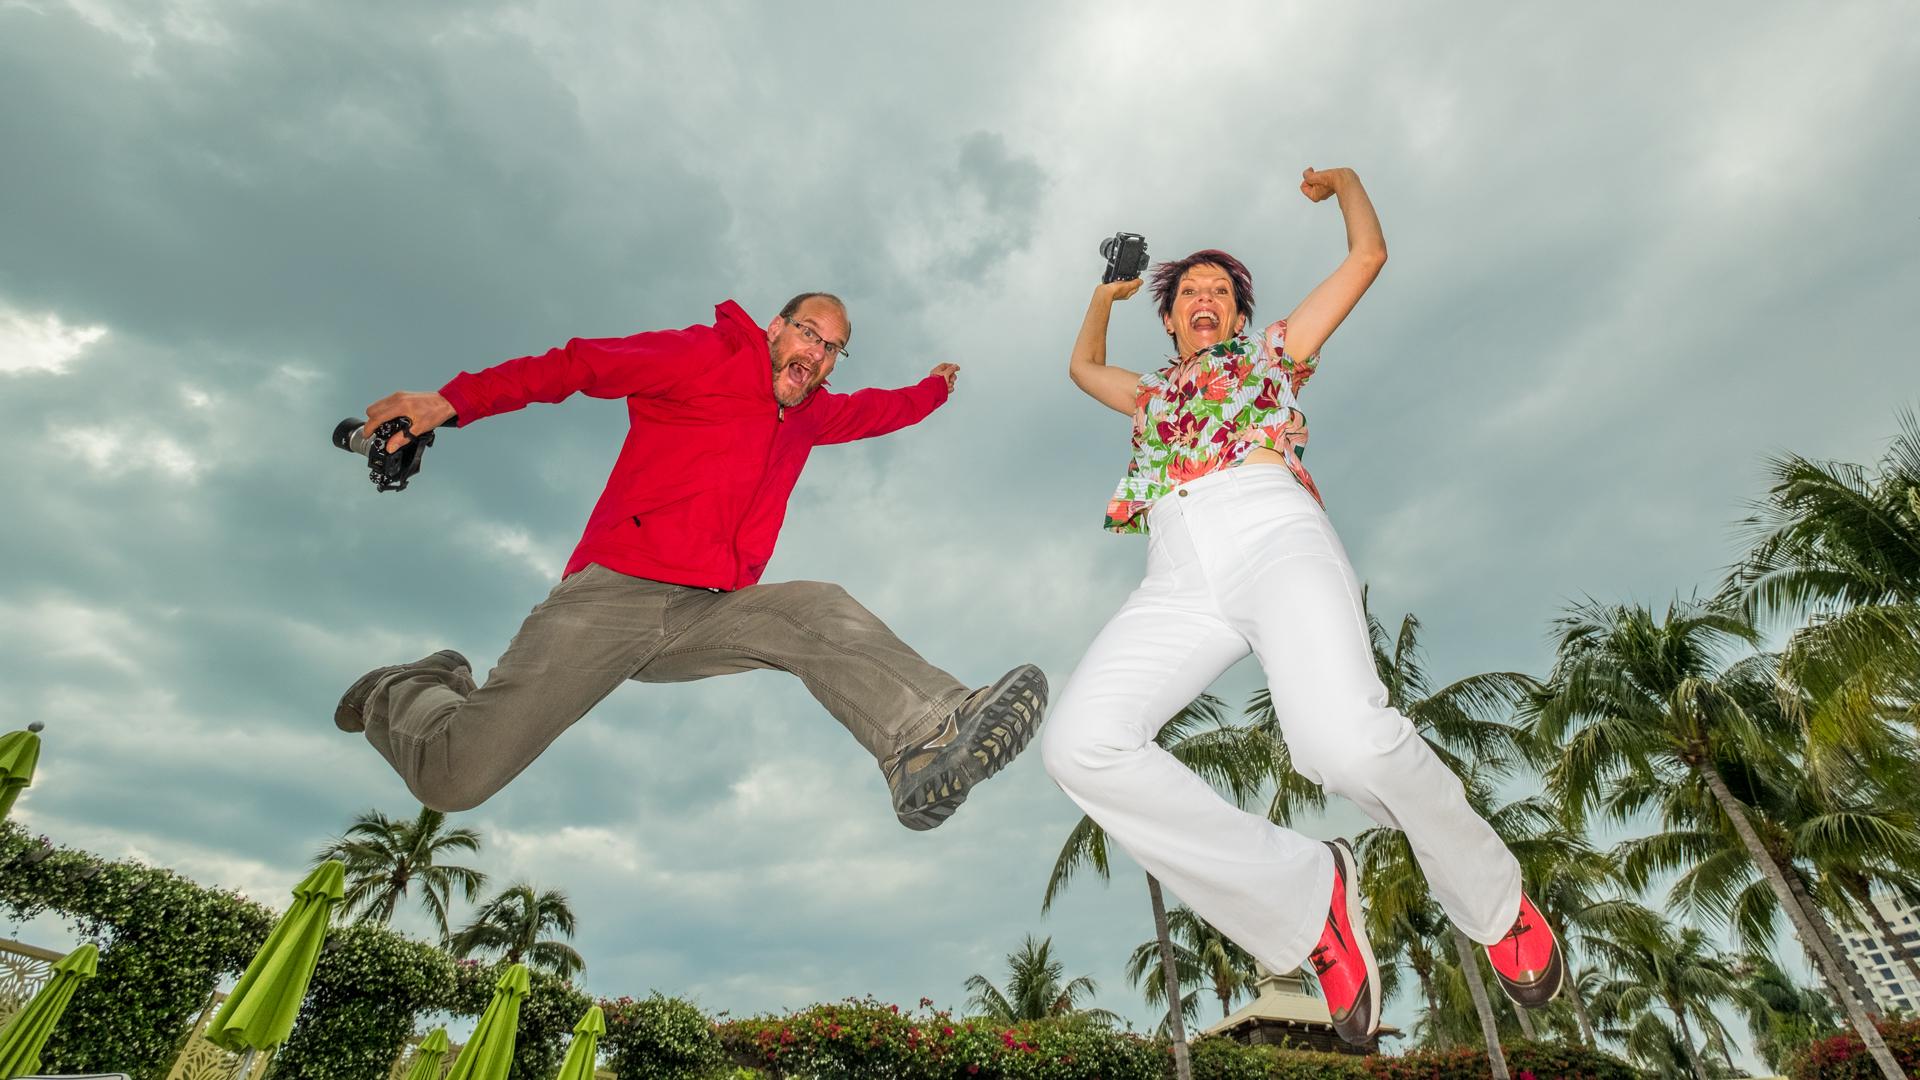 Dan Bailey and Karen Hutton, Fujifilm X Team Photographers, jumping for joy in Florida